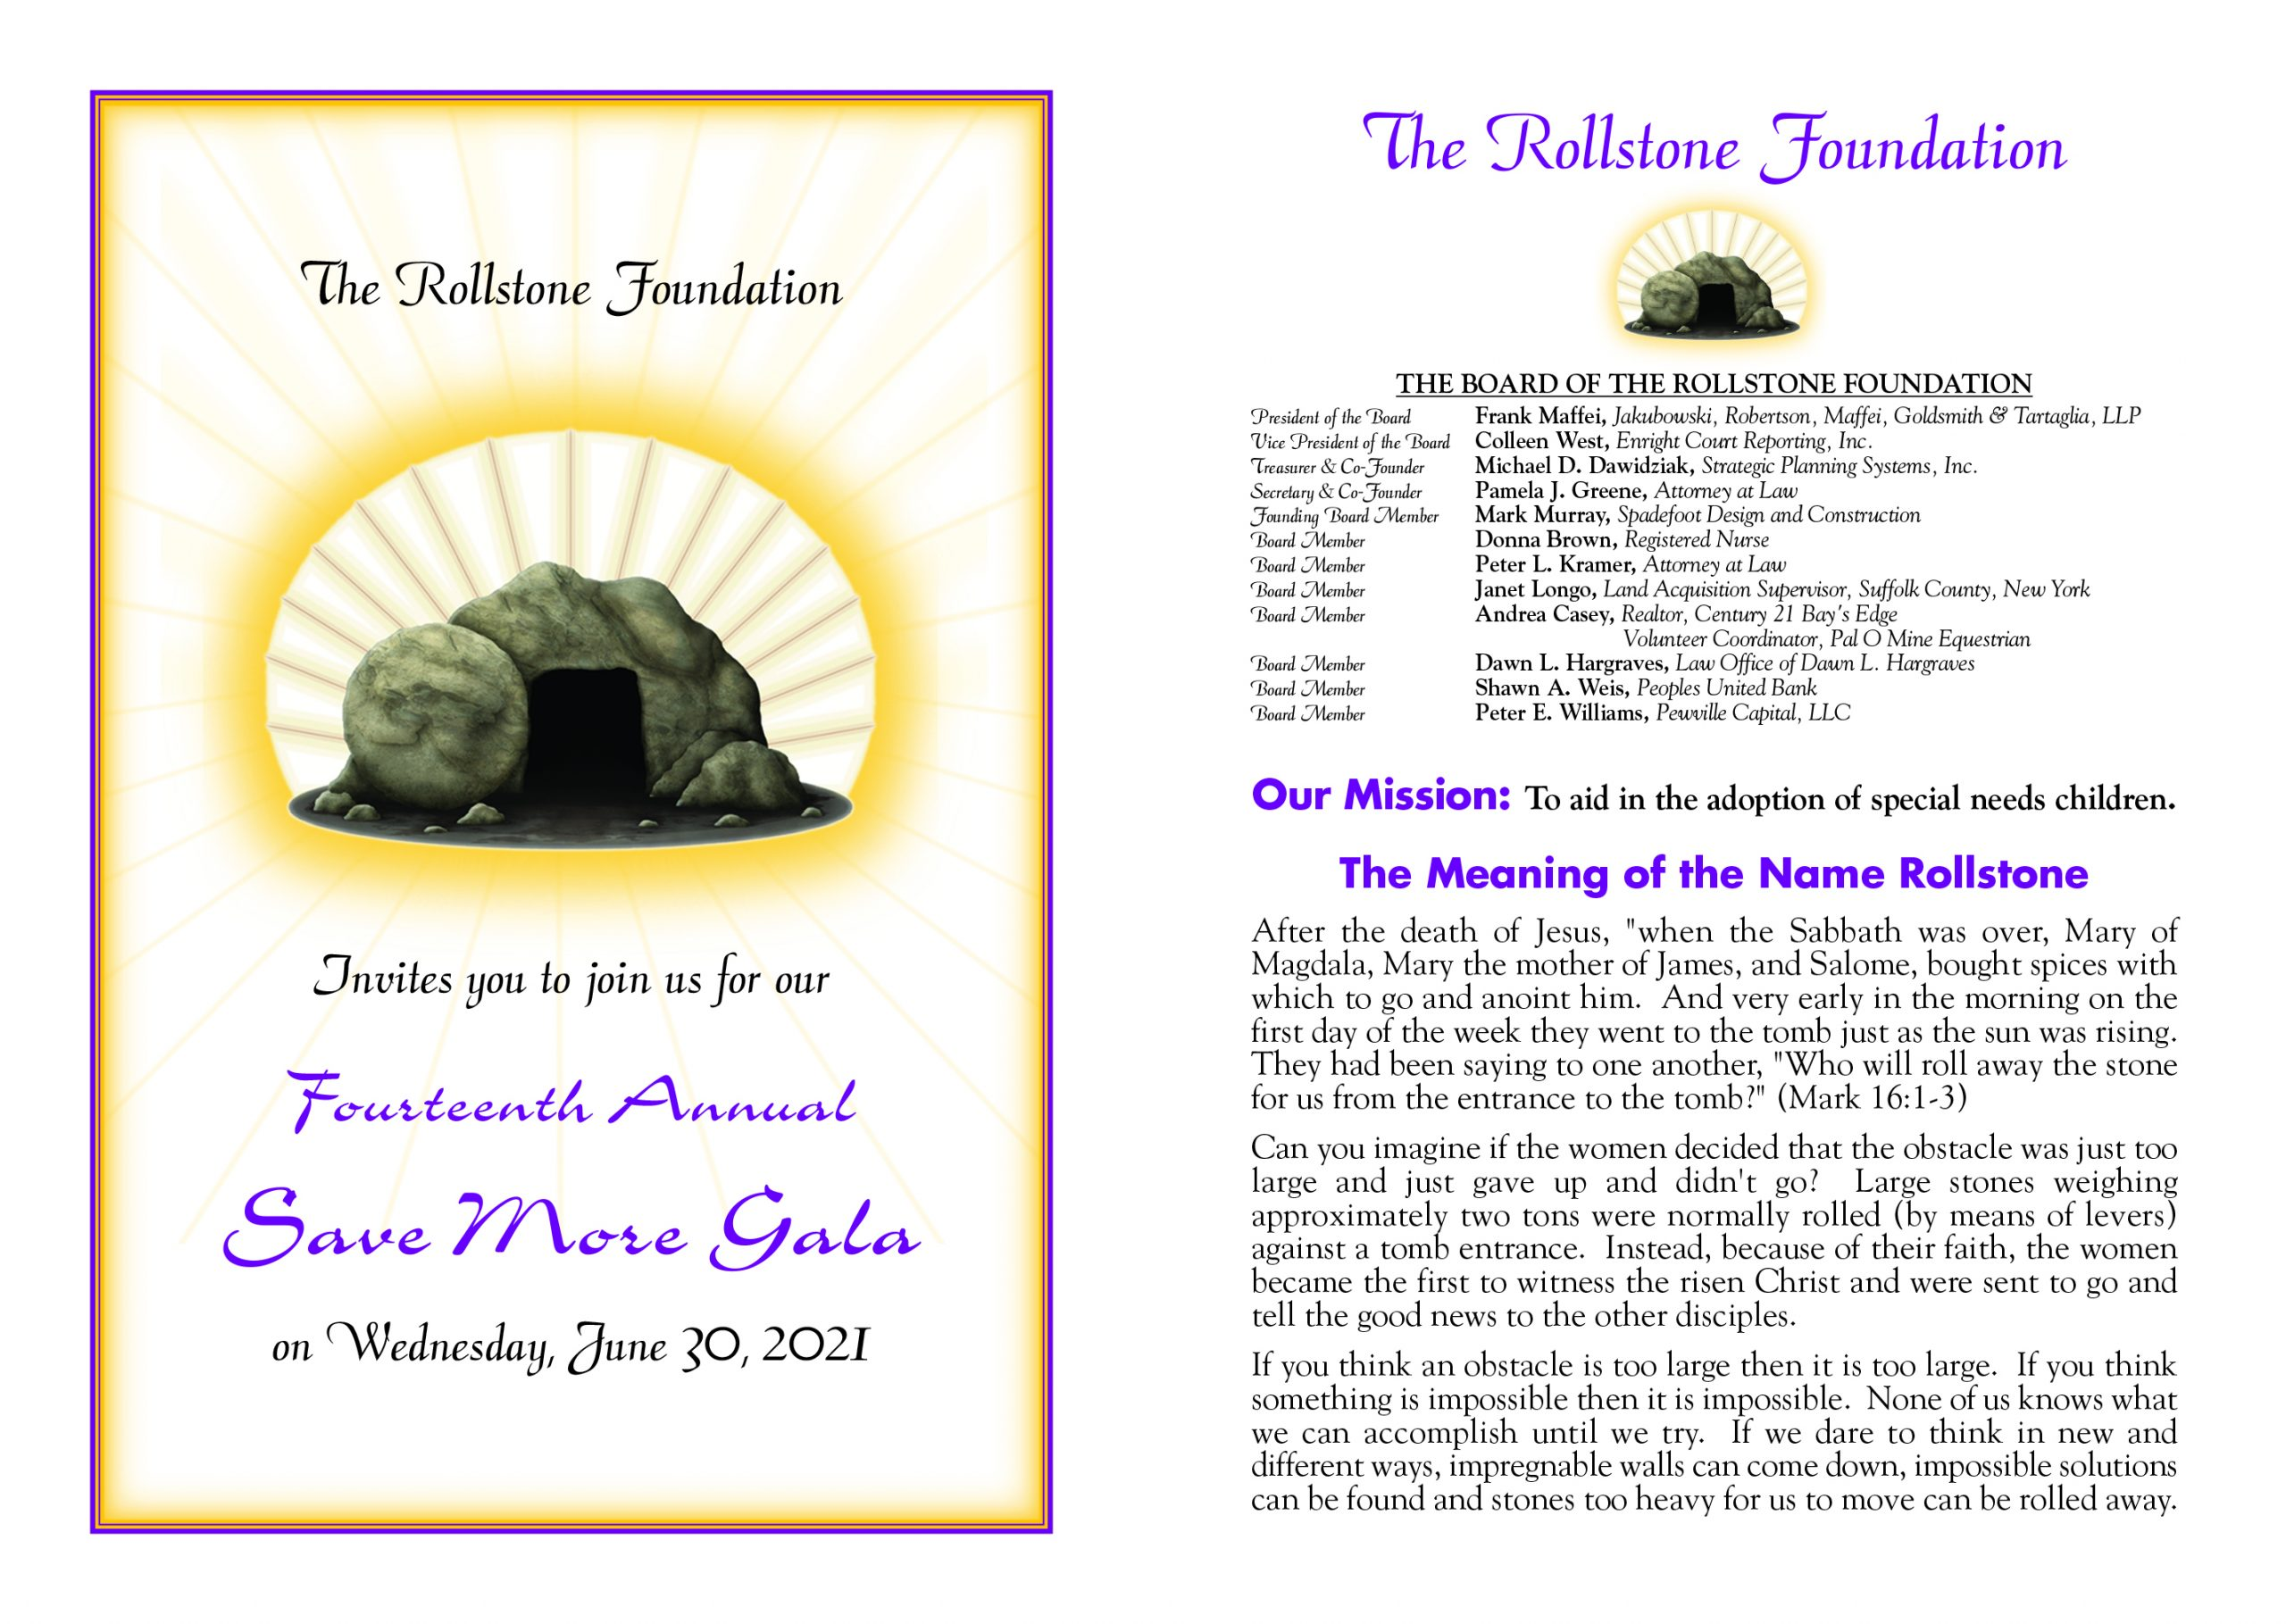 Fourteenth Annual Save More Gala